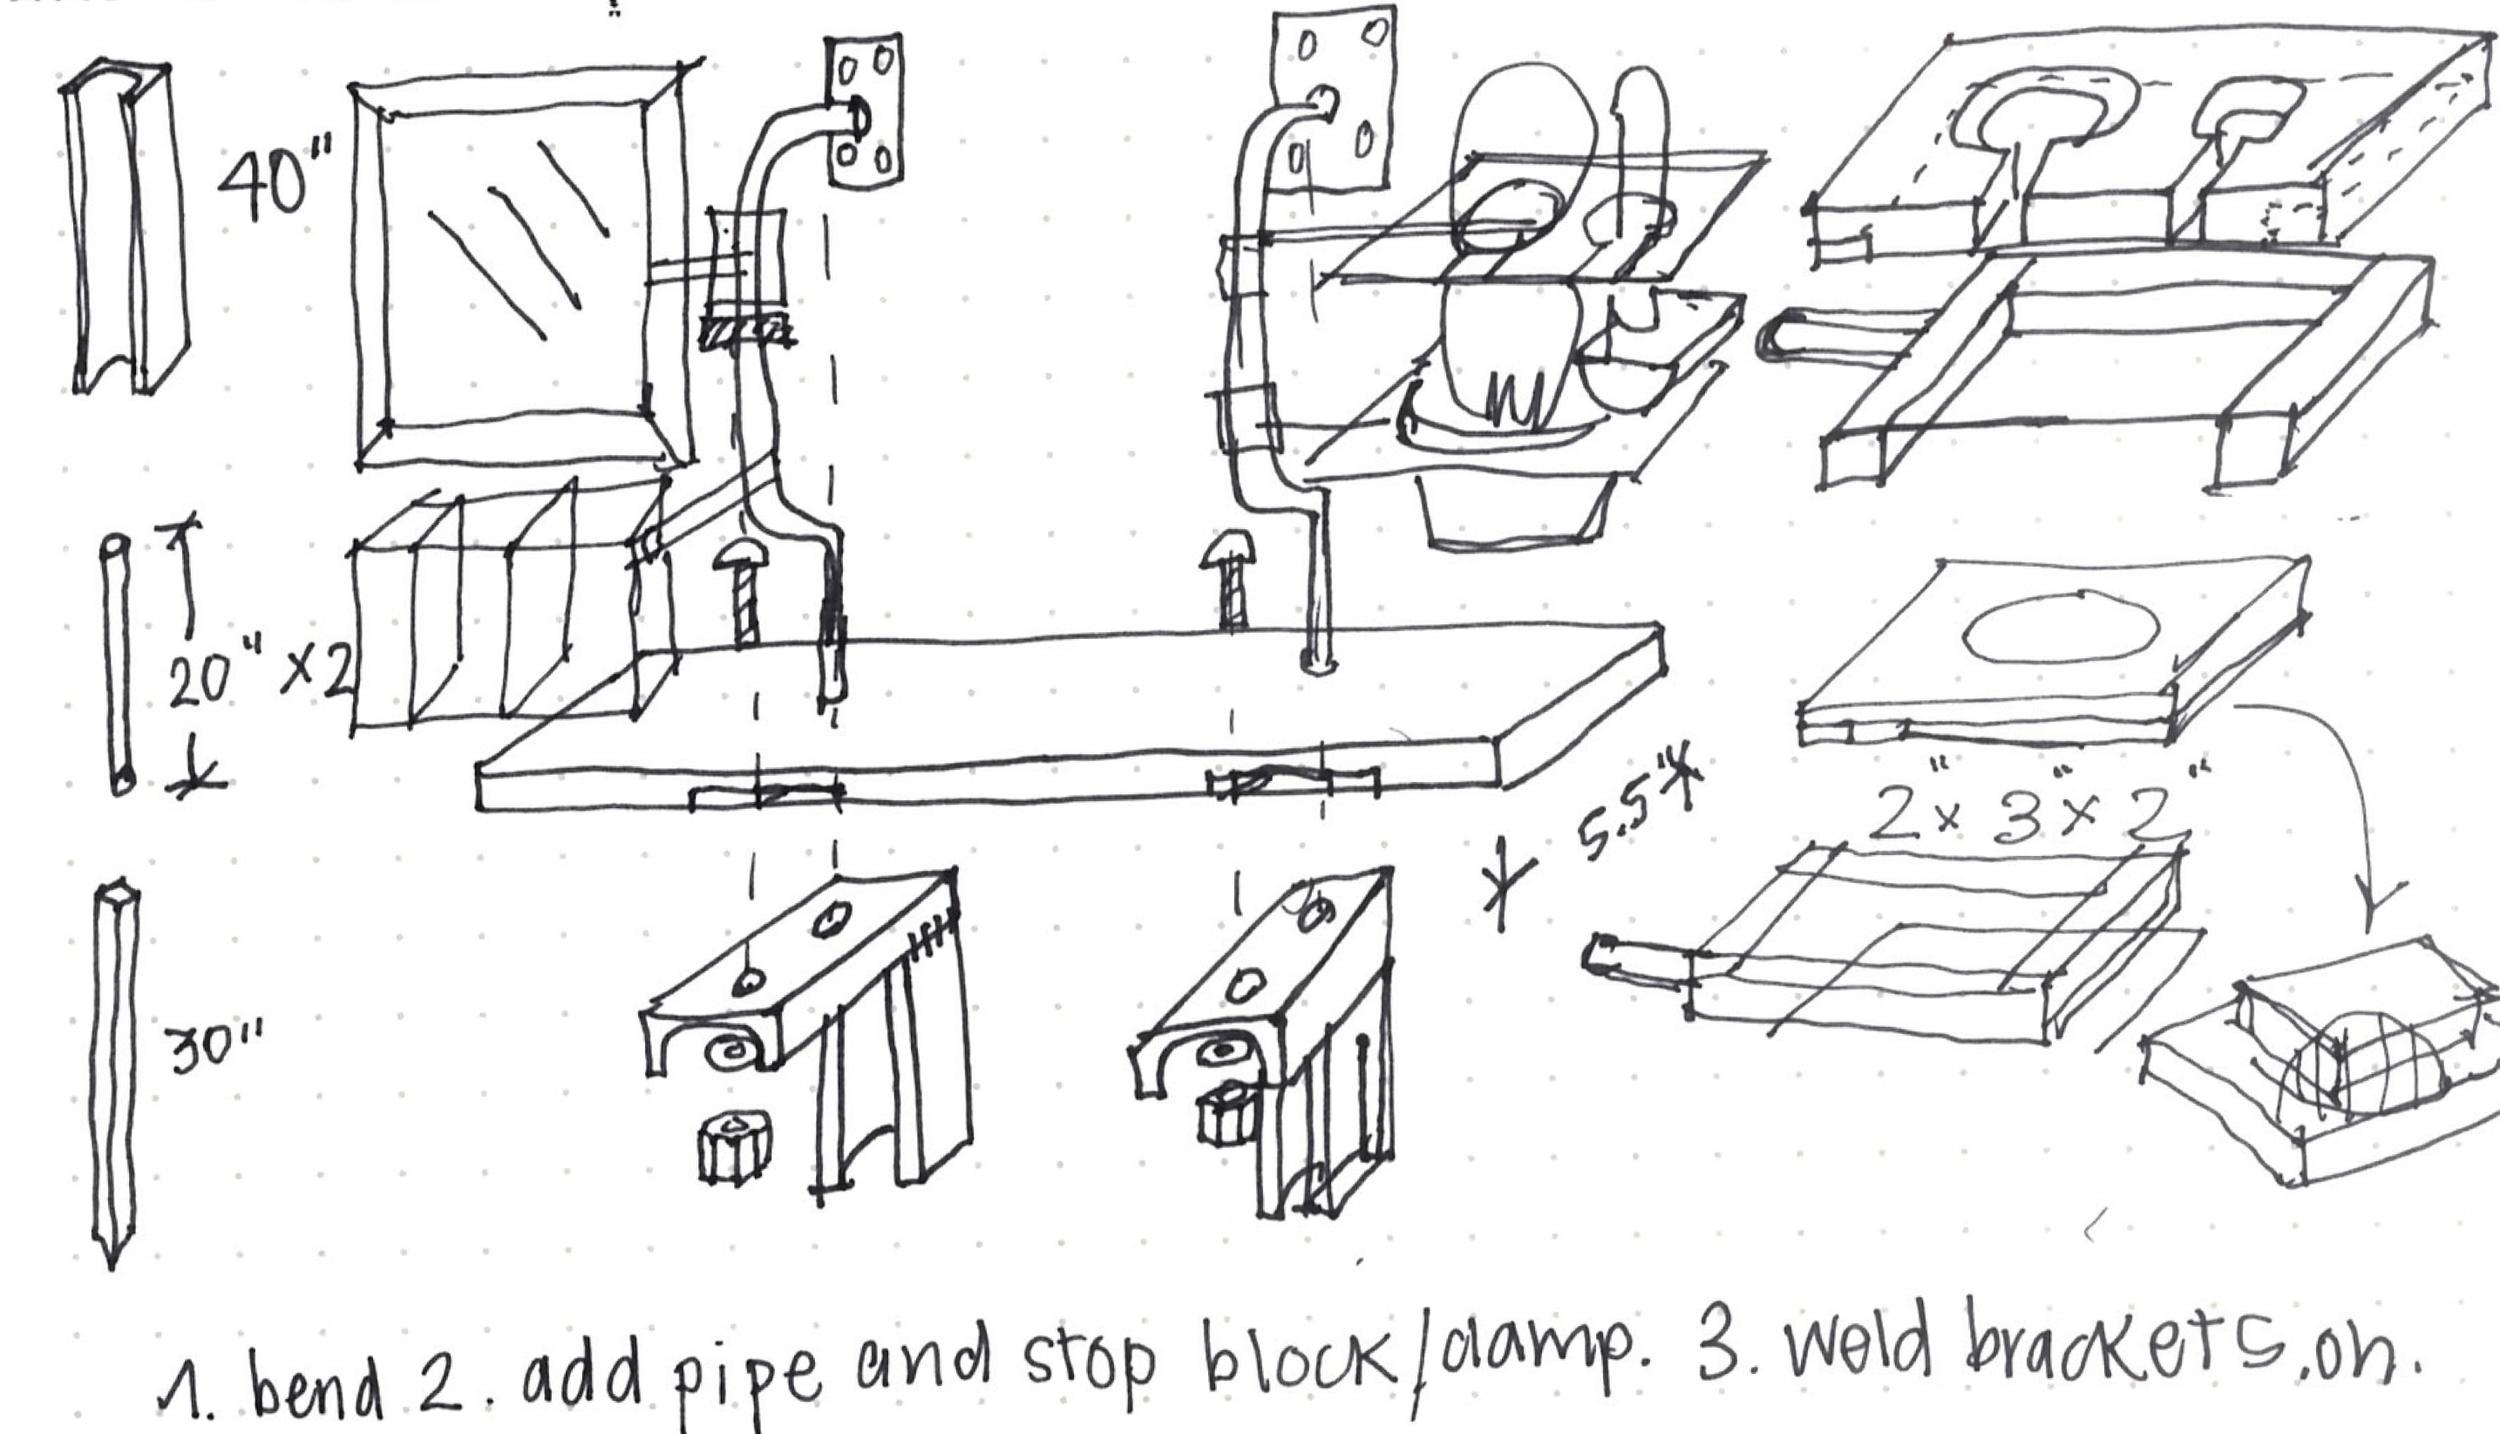 tech sketch of rj shelf prototype